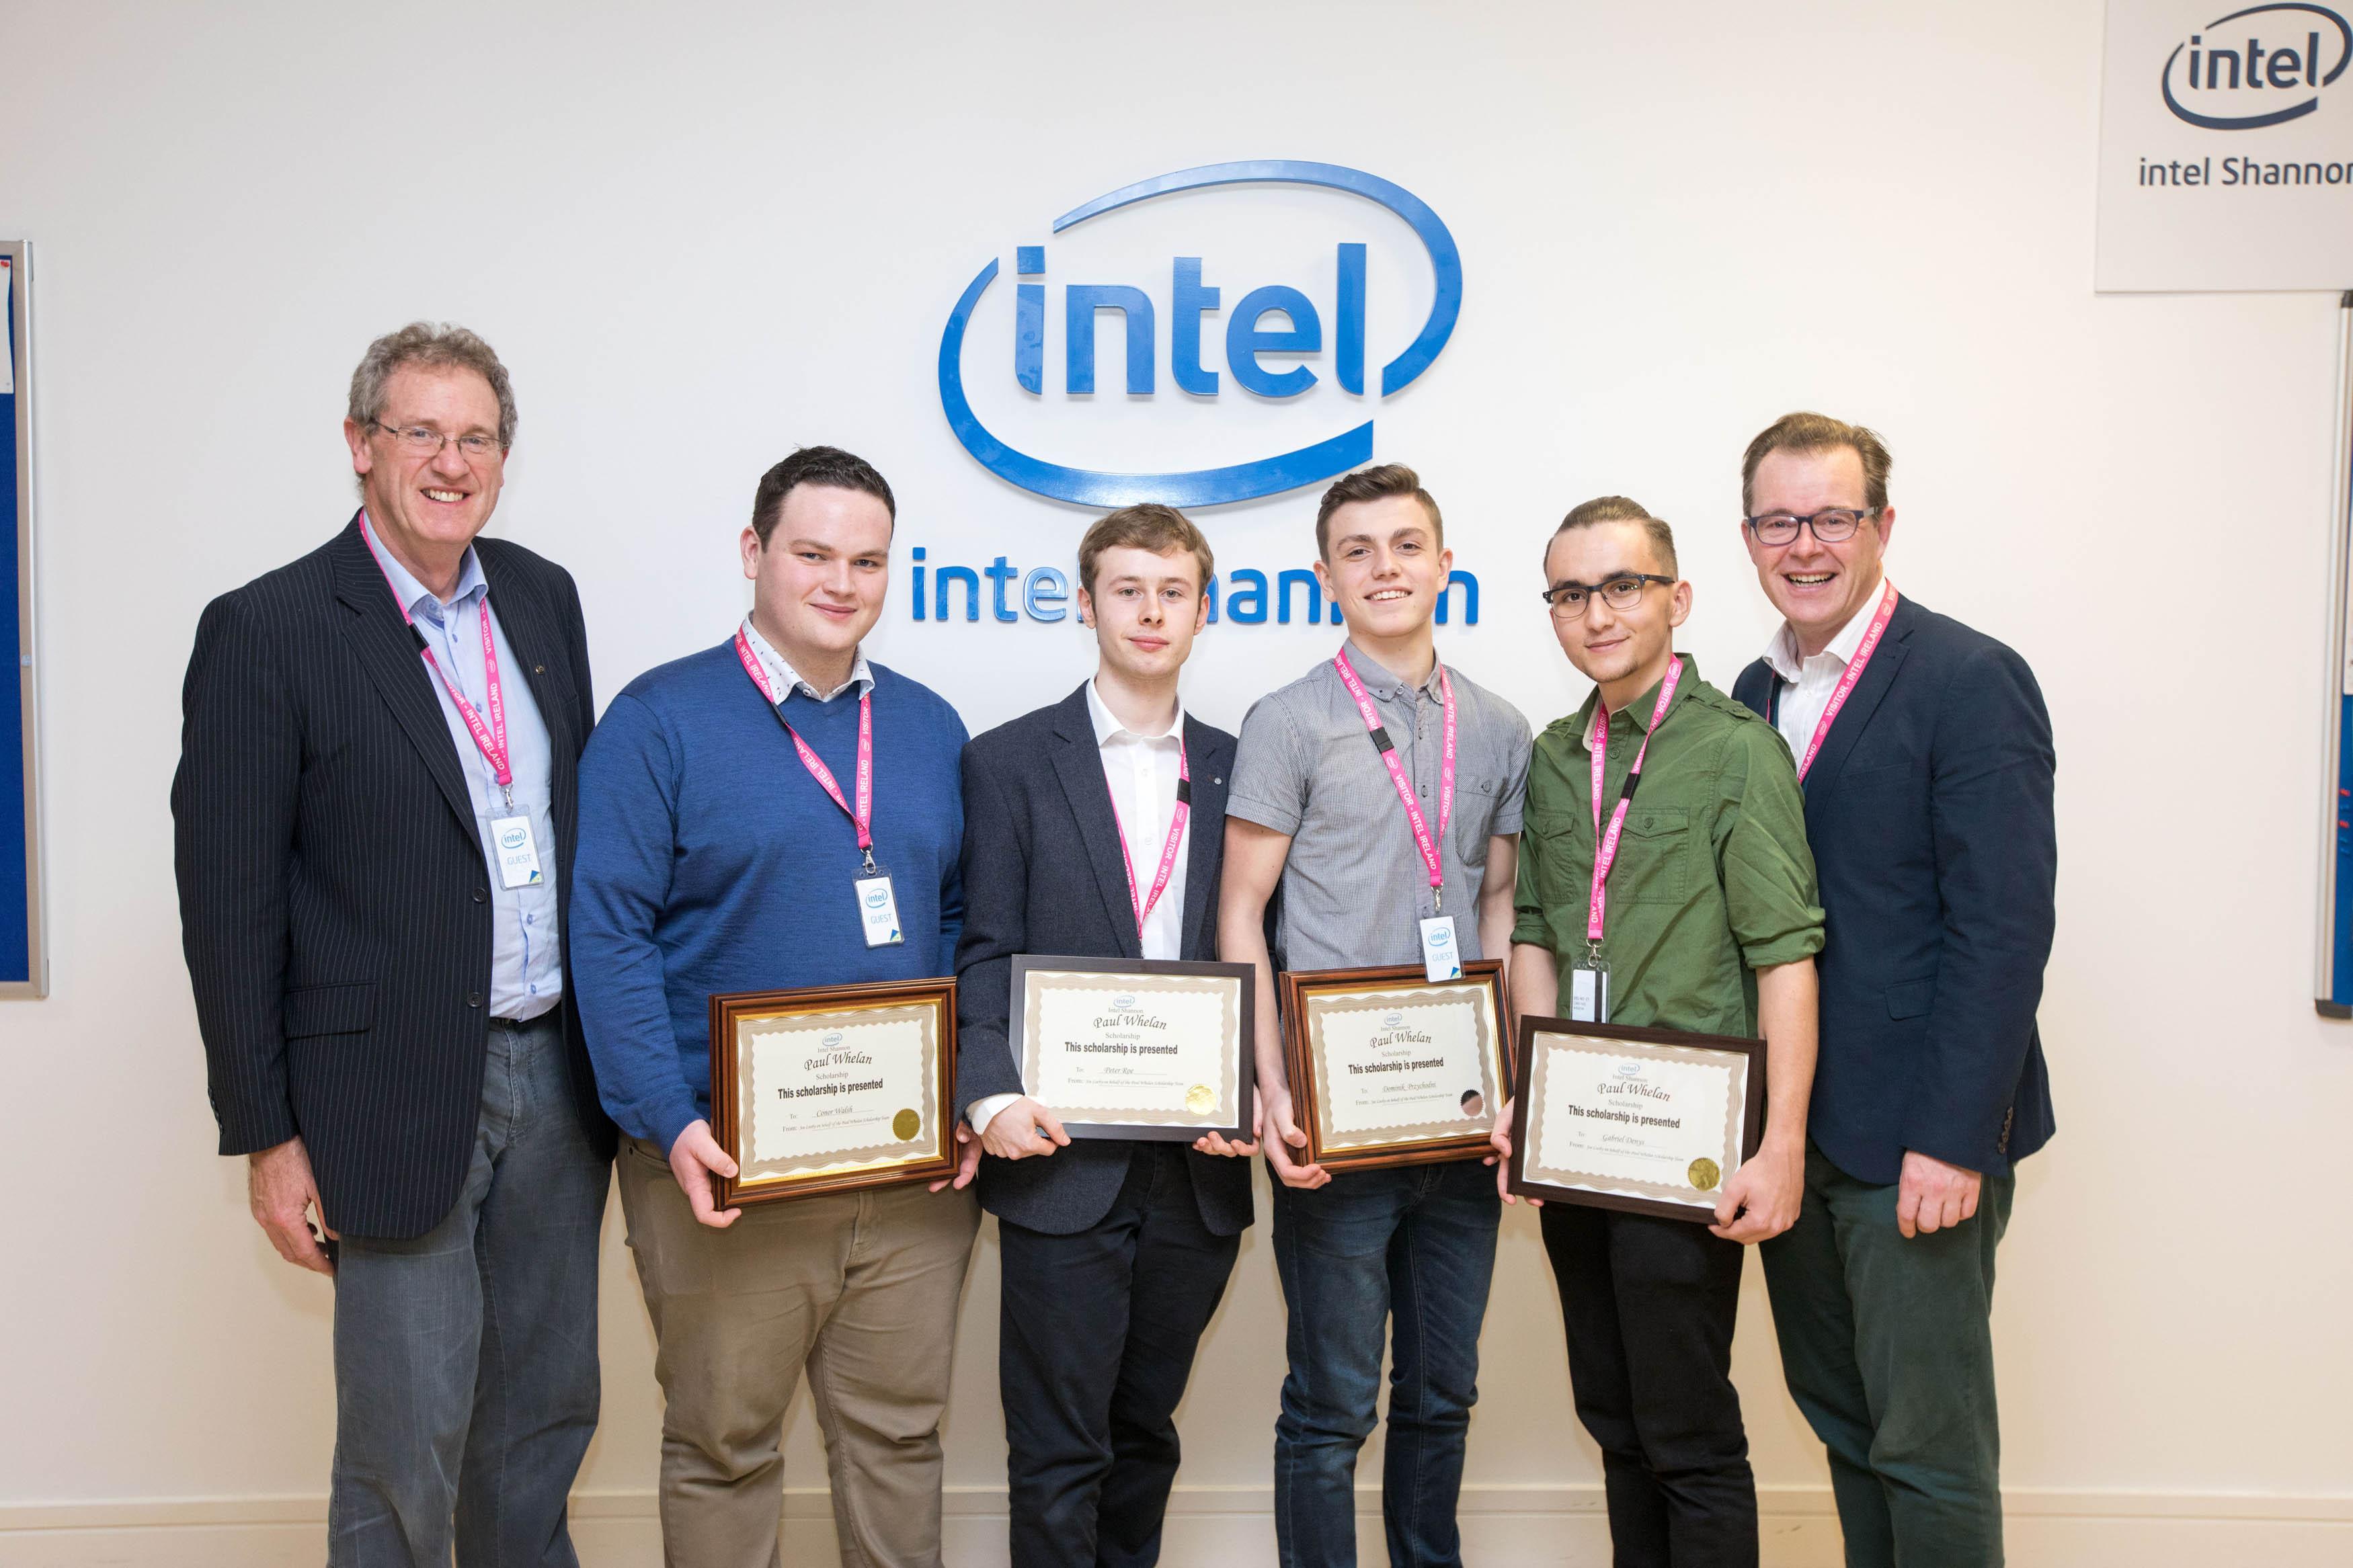 Intel Shannon Scholarship Awards 2017